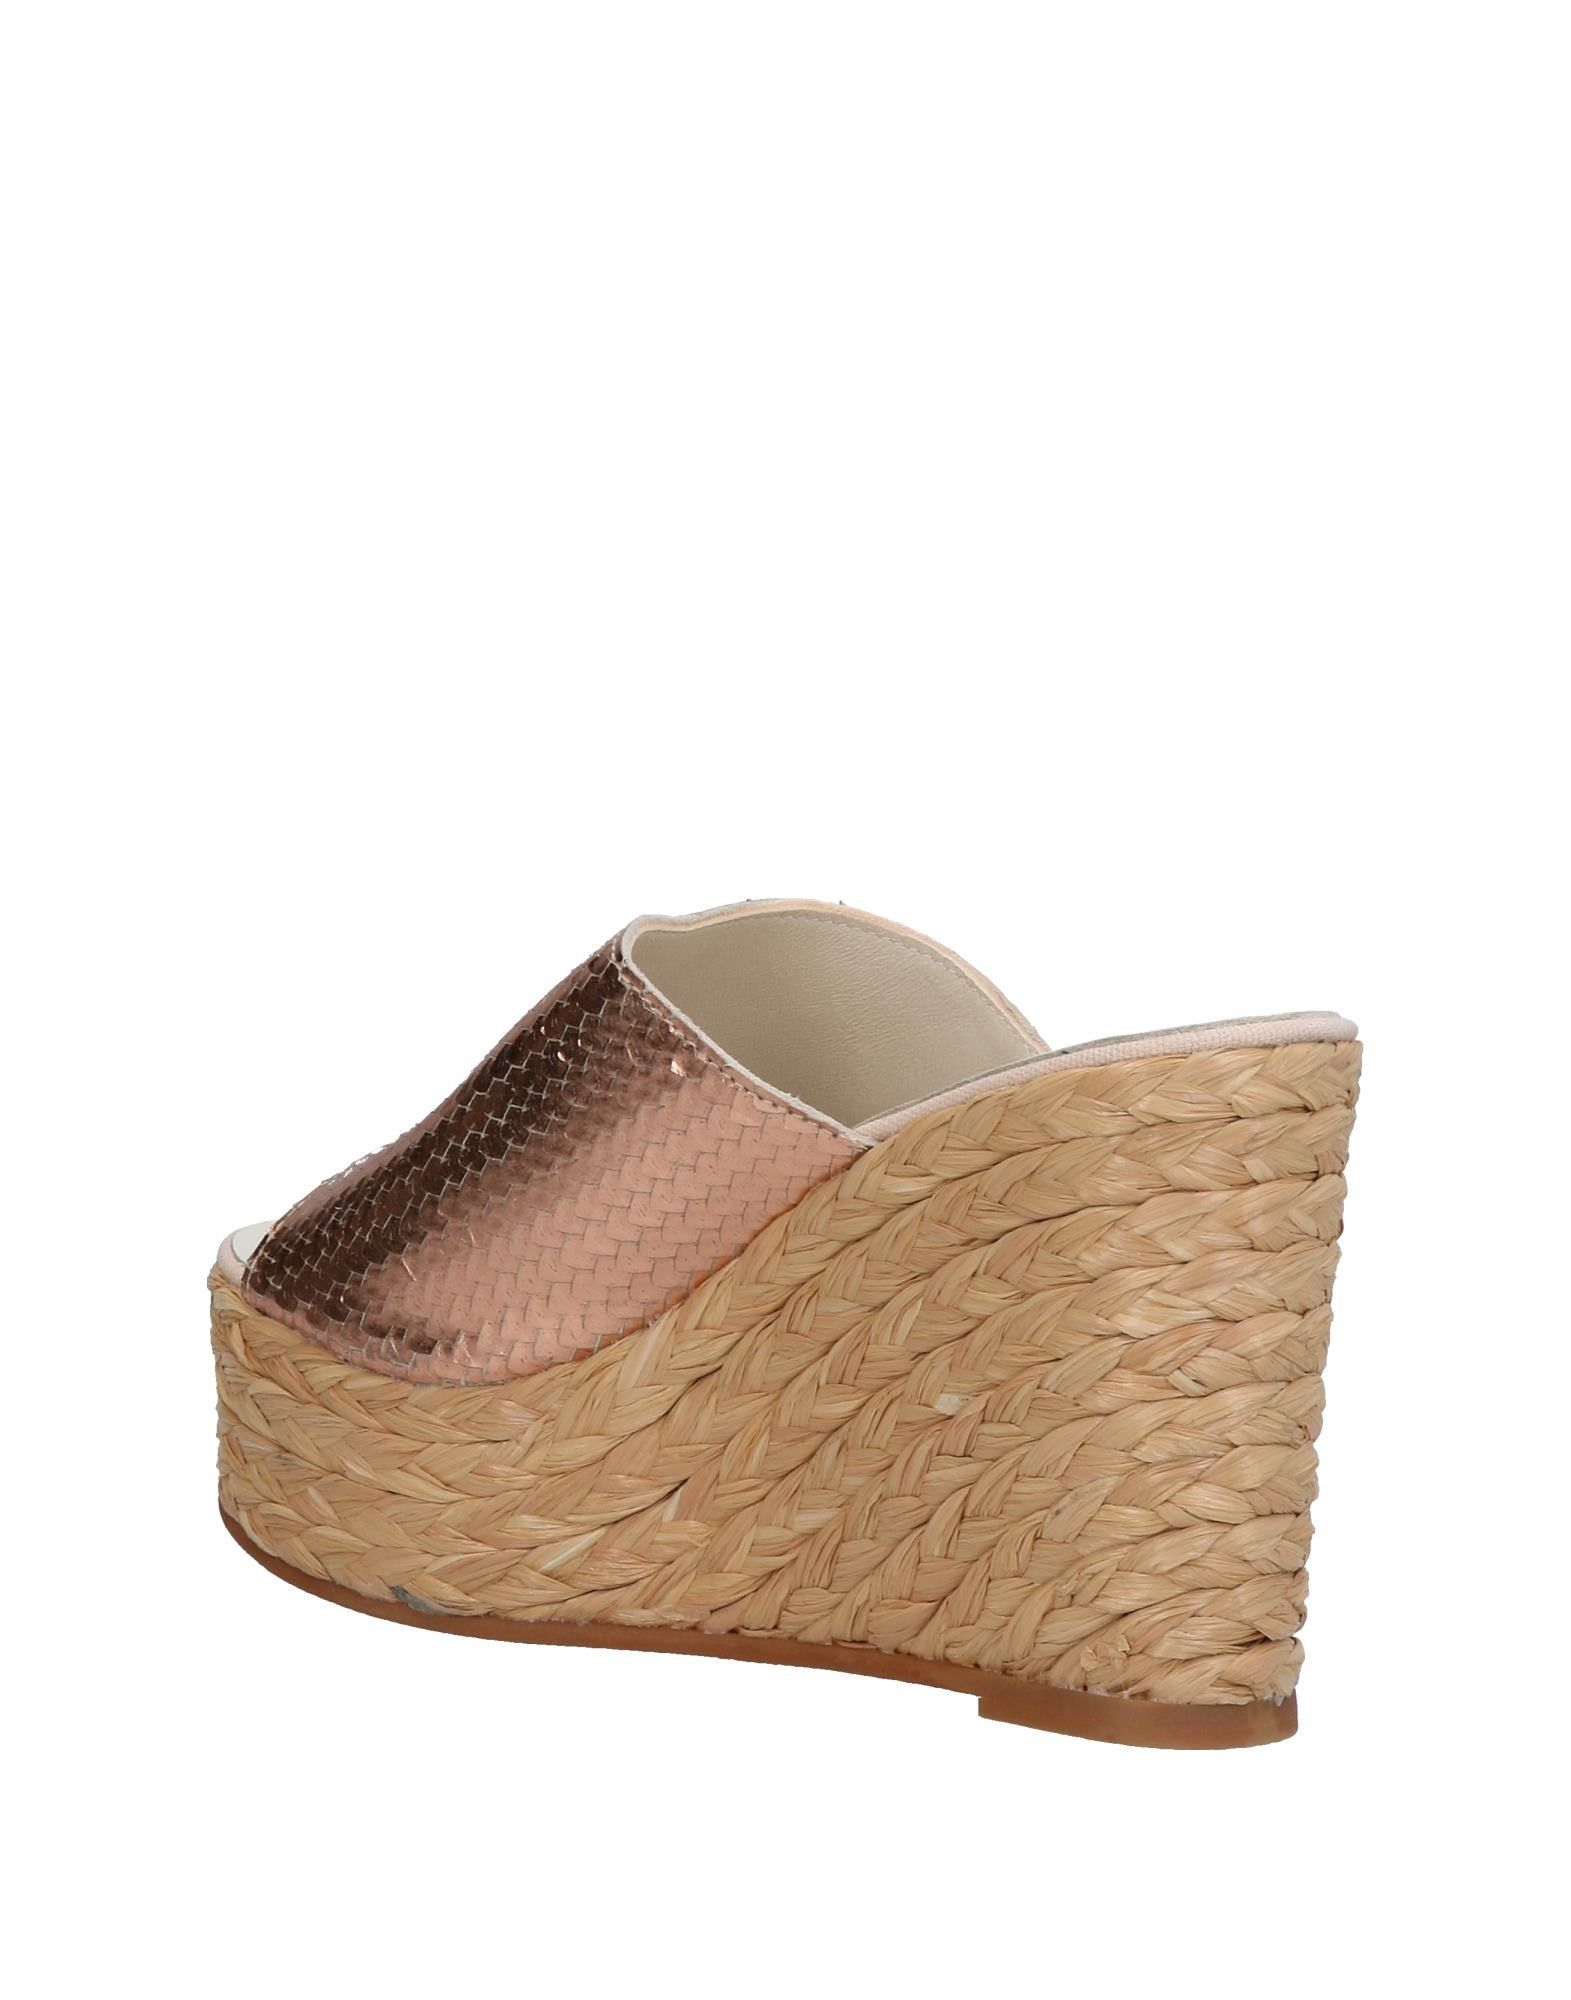 Espadrilles Sandalen Damen  11378936XW Gute Qualität beliebte Schuhe